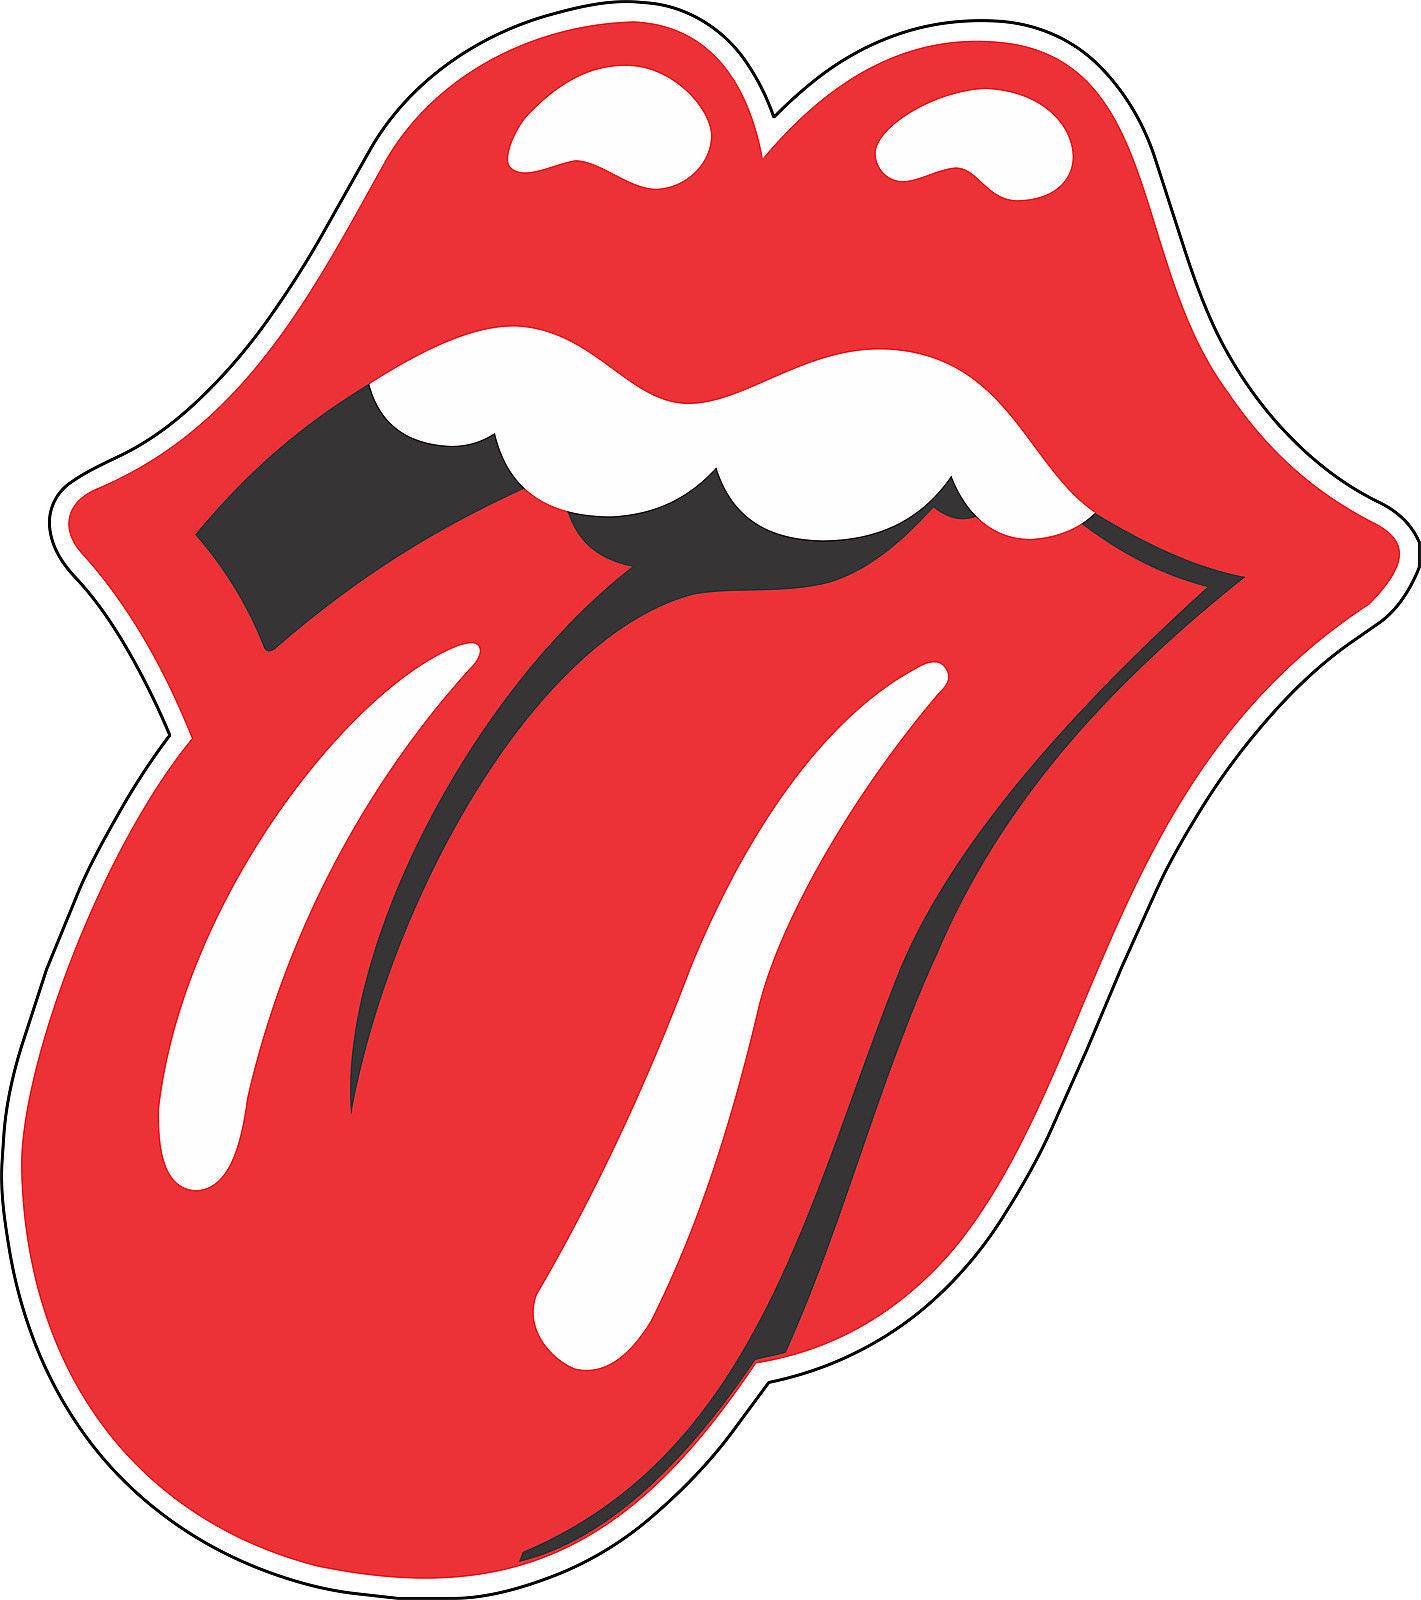 3 Rolling Stones Tongue Music Bumper Sticker Wall Decor Vinyl